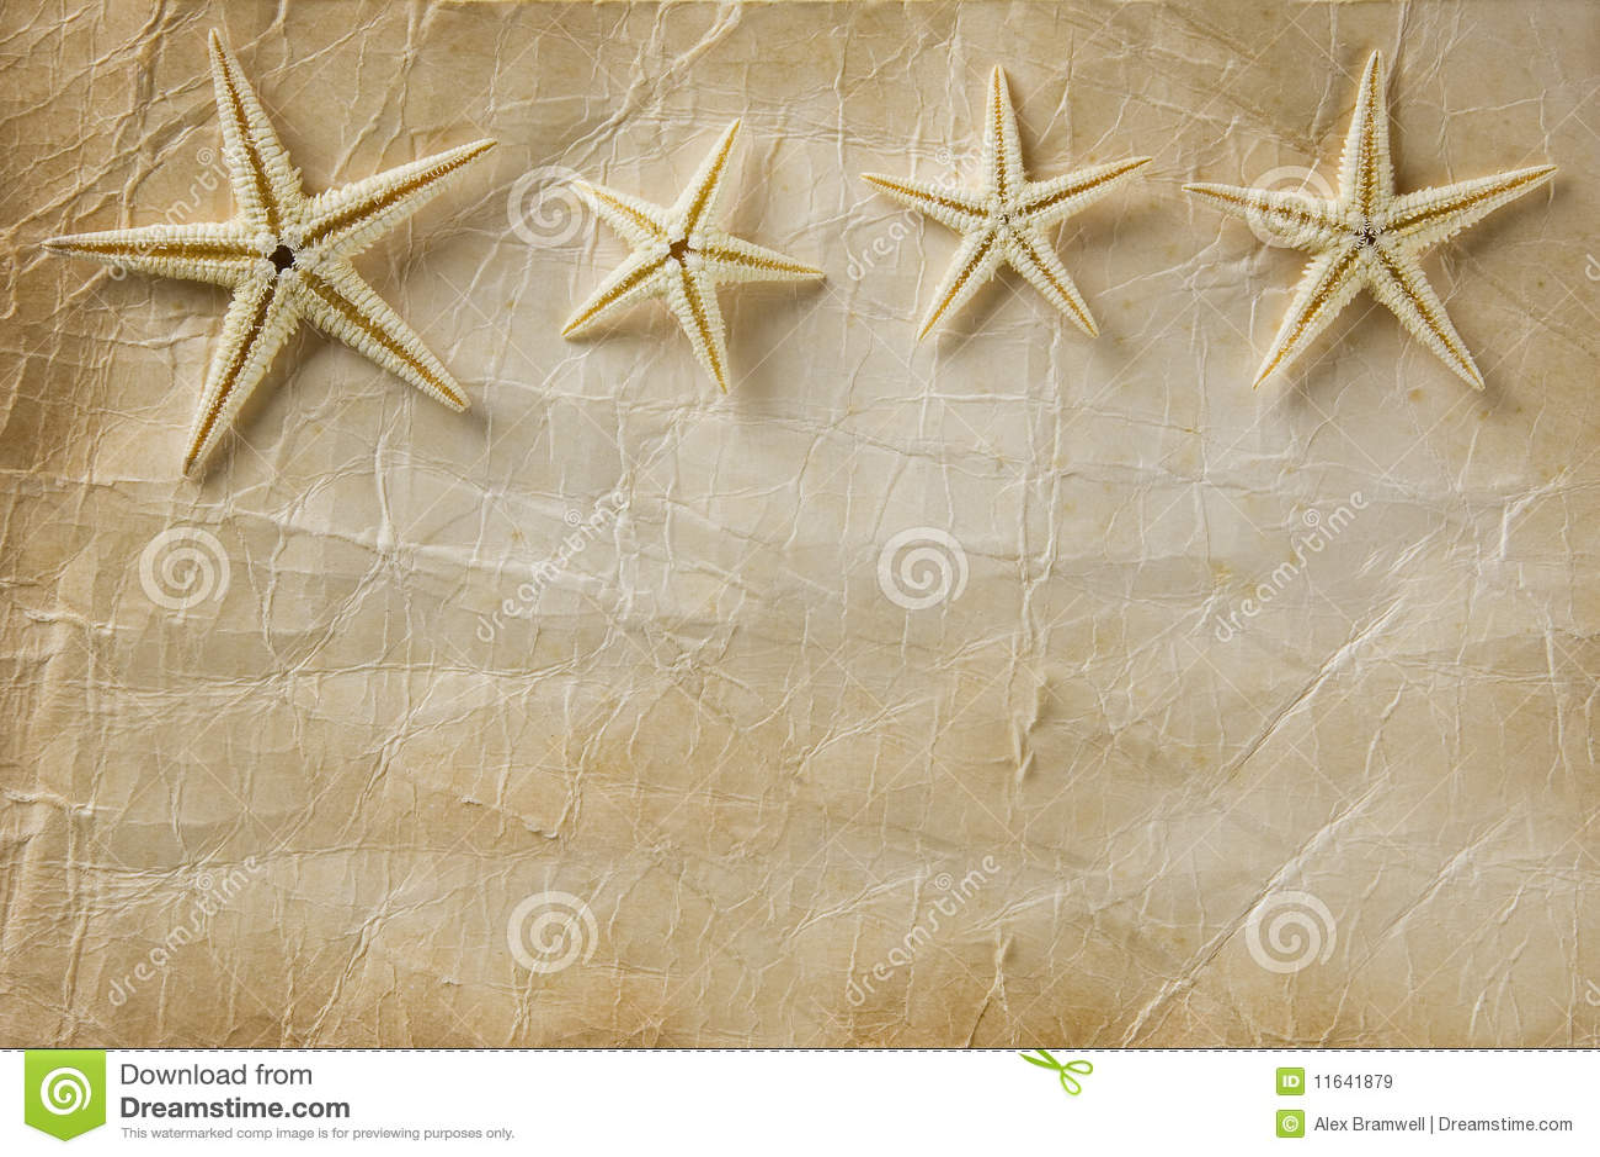 Essay on starfish